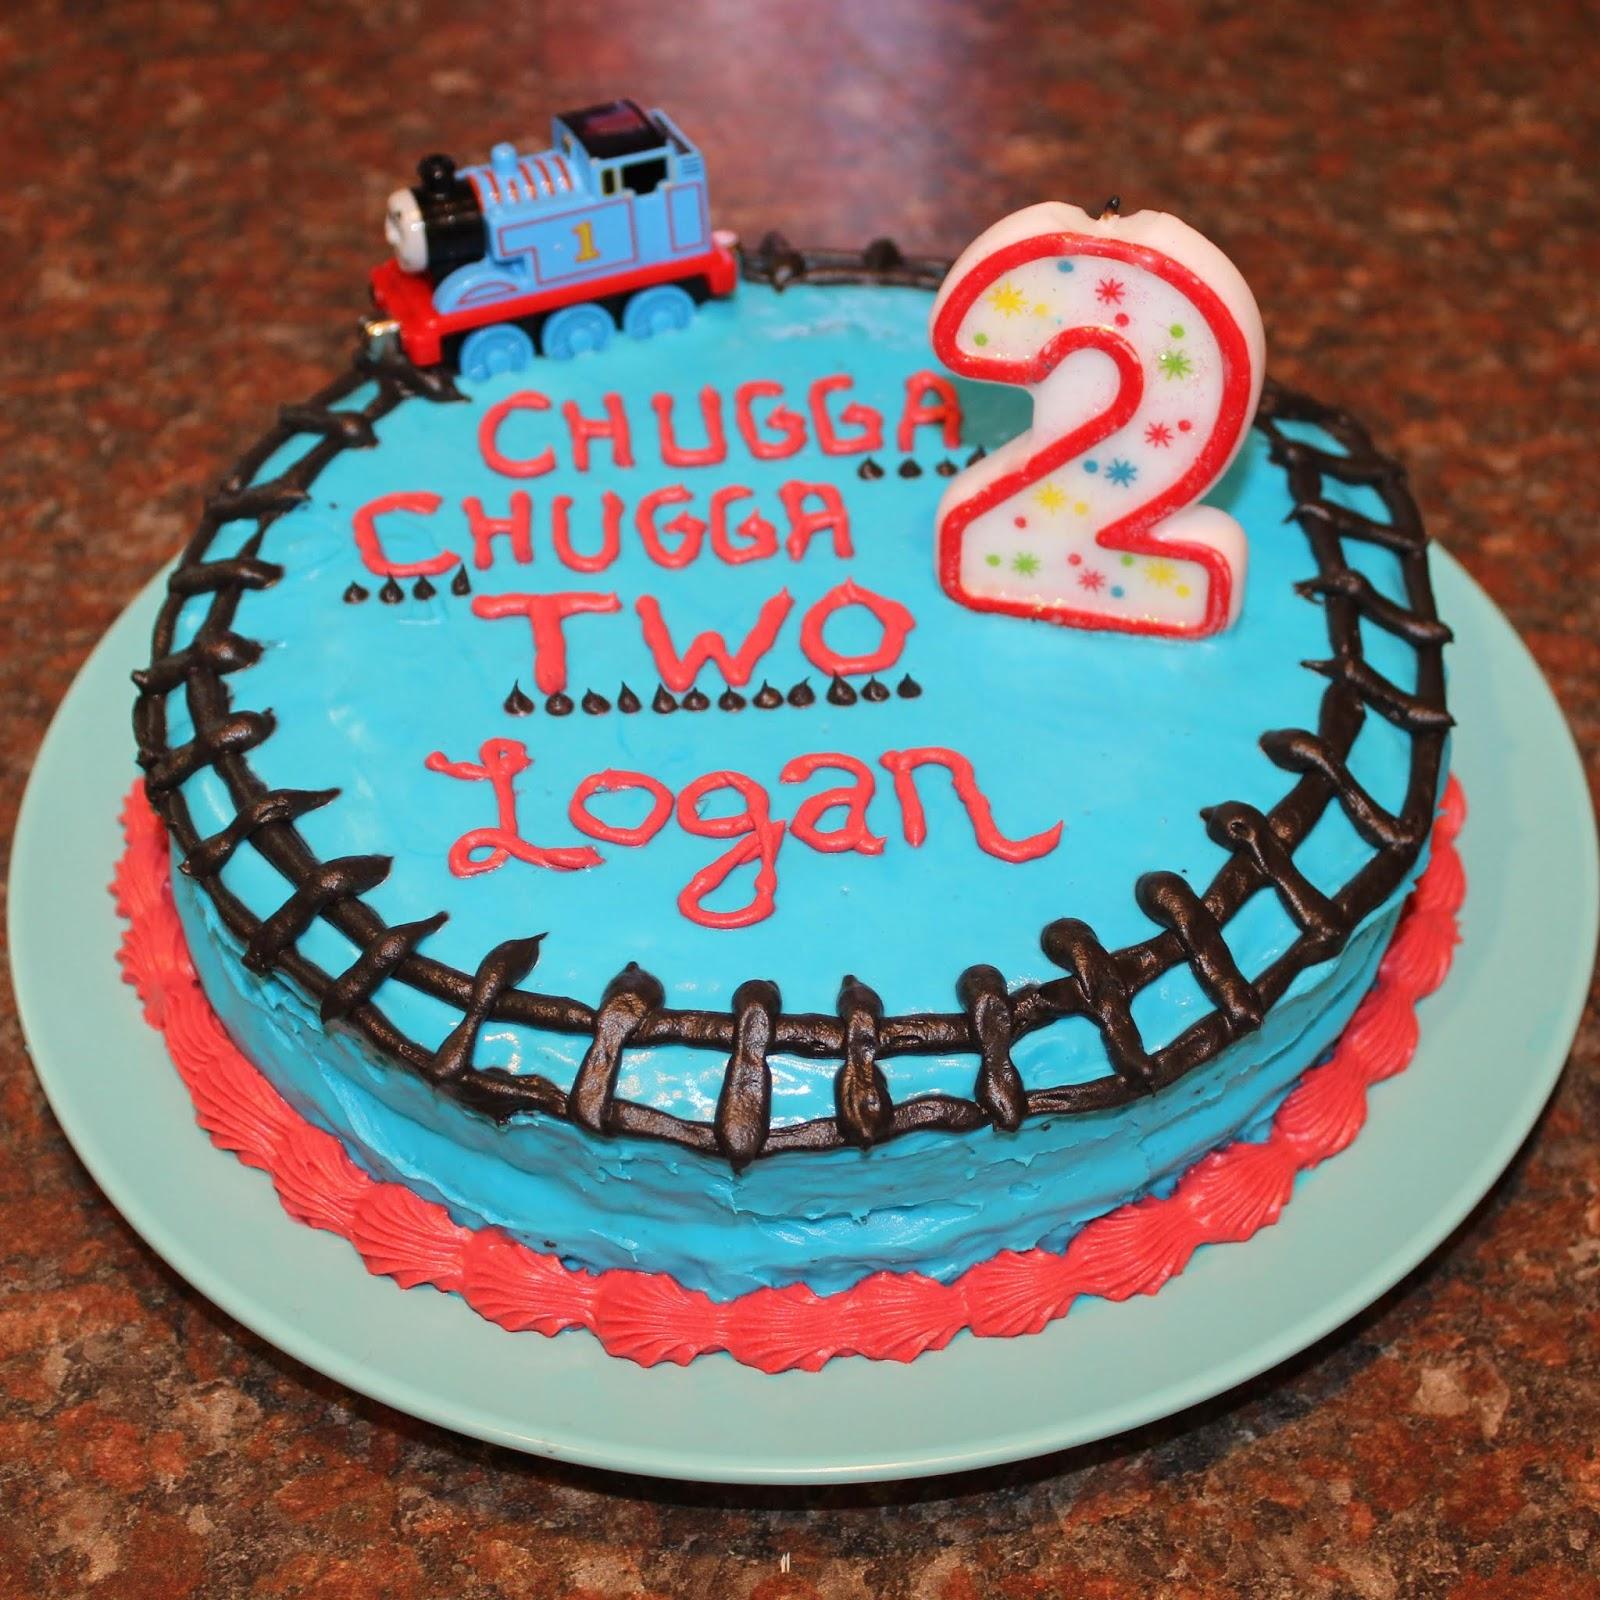 Superb Thomas The Train Birthday Party Chugga Chugga Two Two Funny Birthday Cards Online Eattedamsfinfo